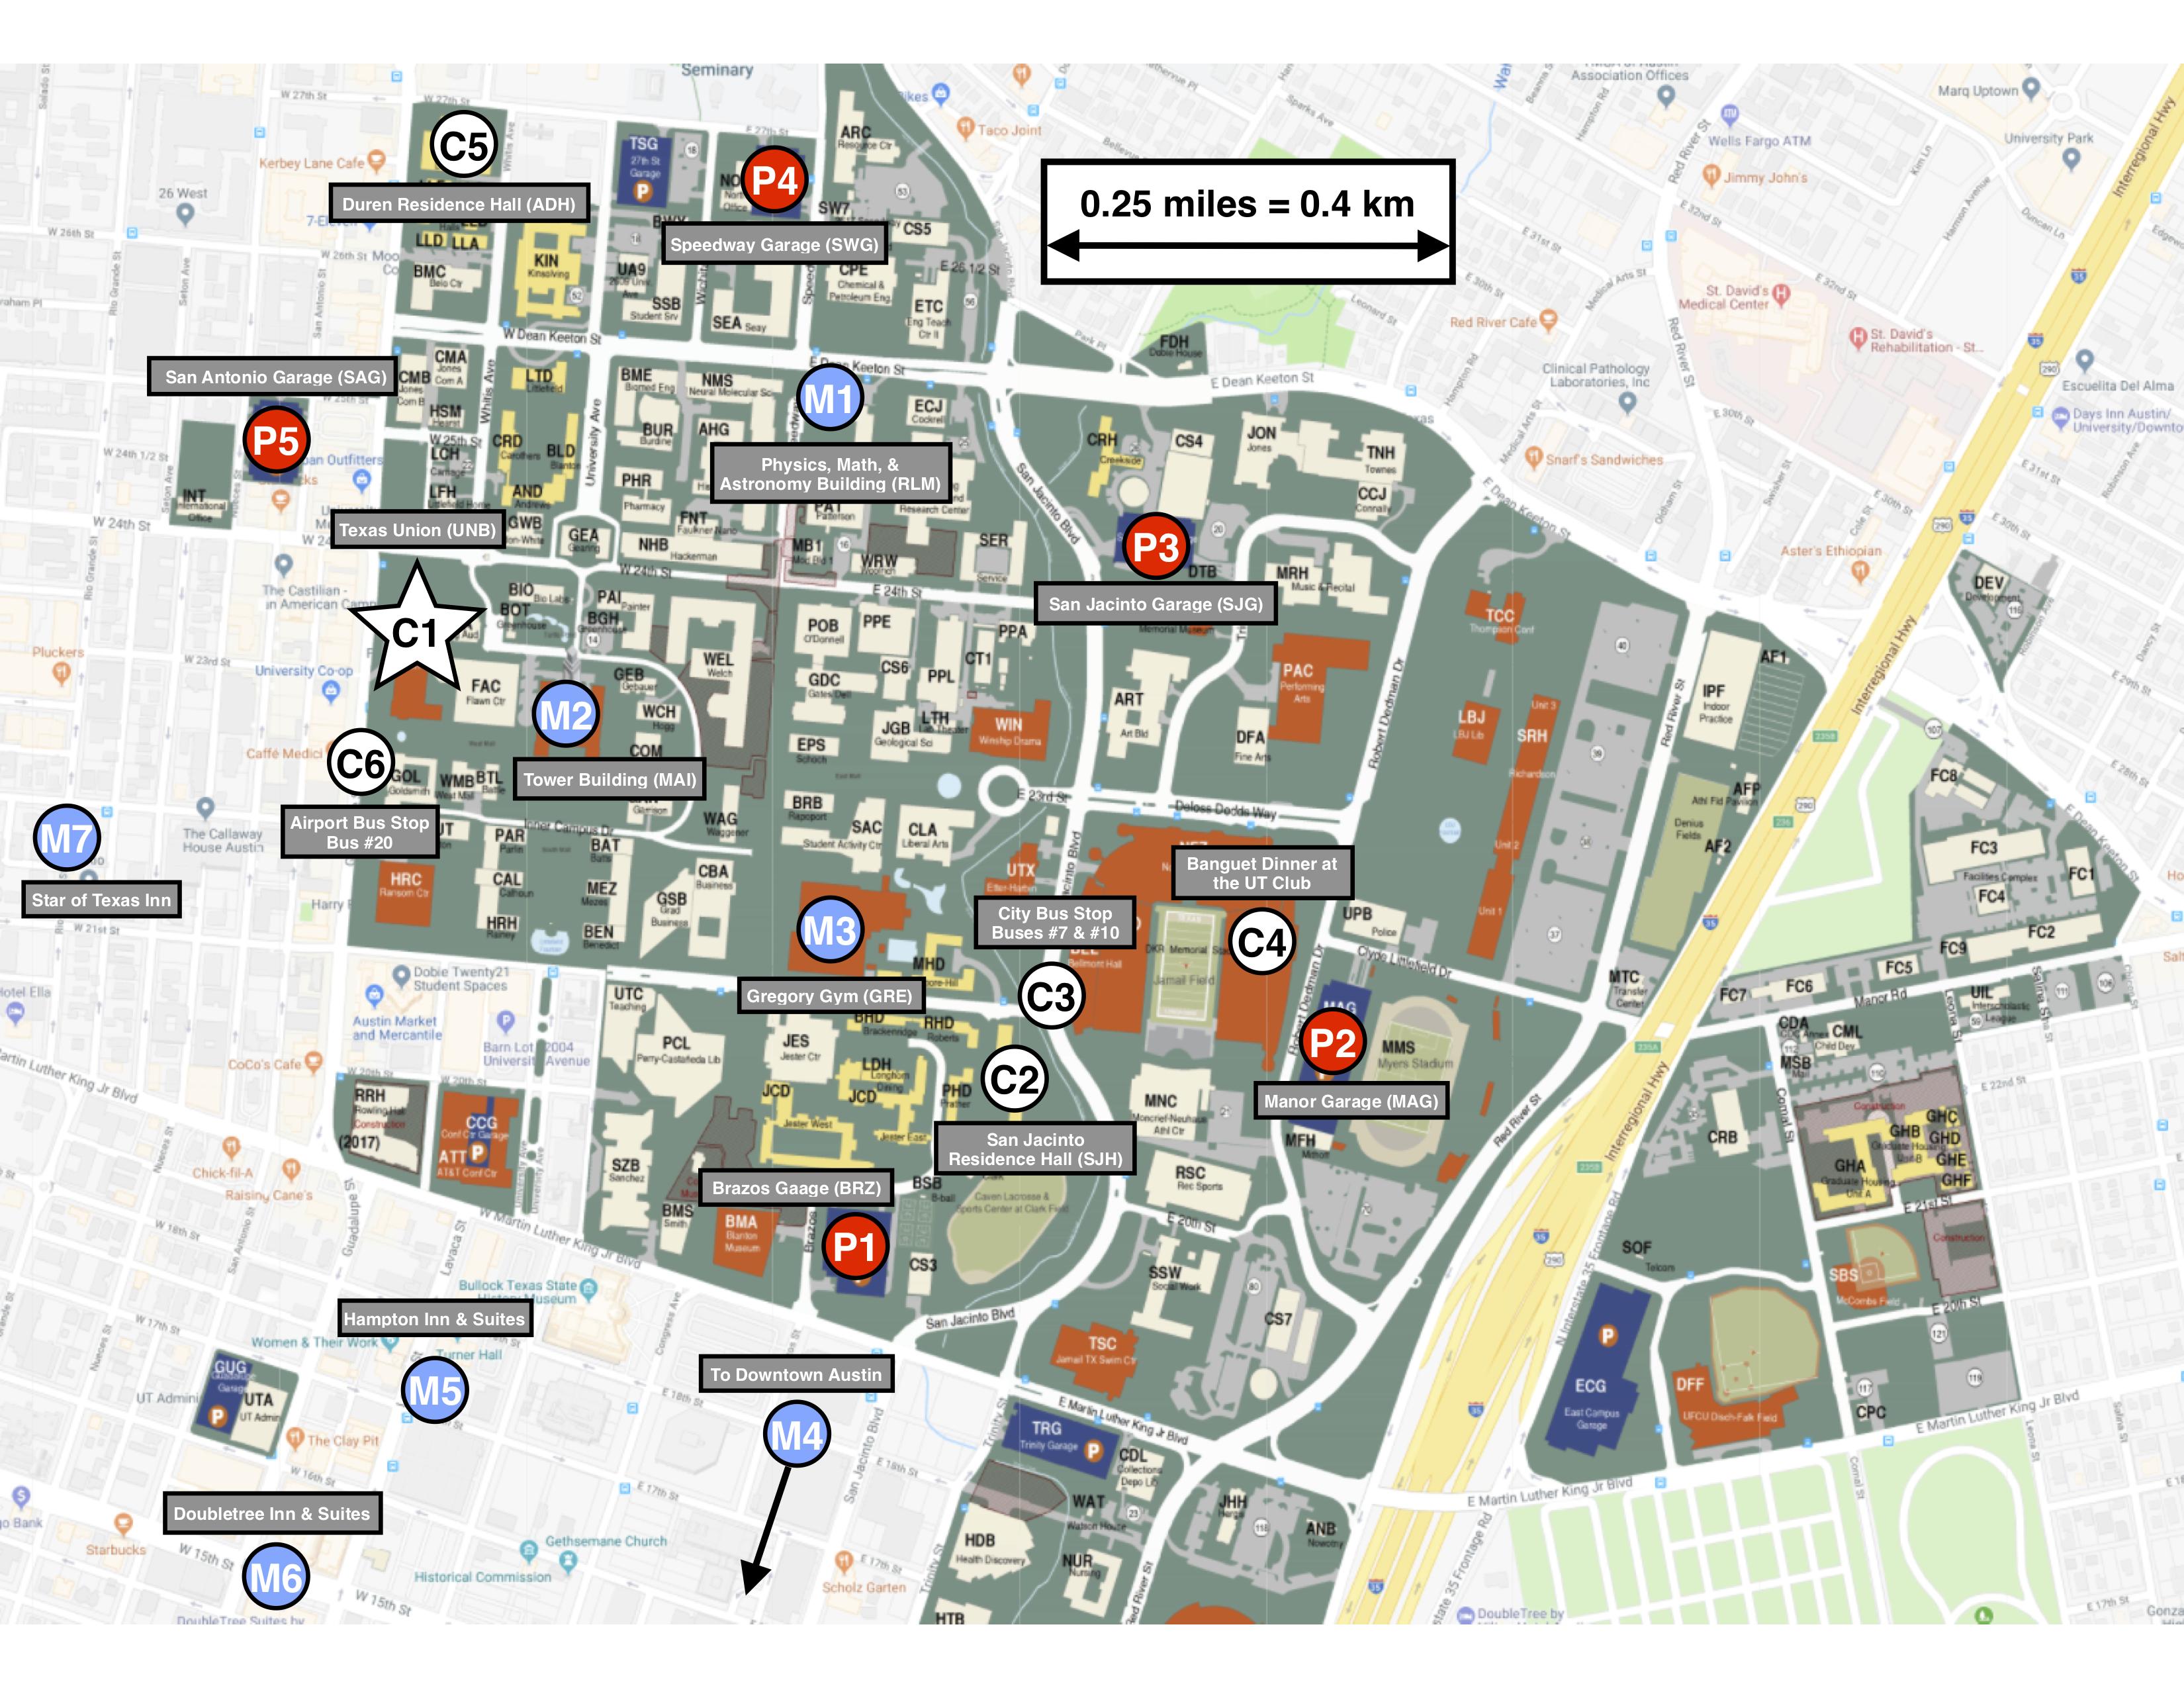 University Of Texas Campus Map Austin Info | eurowd21